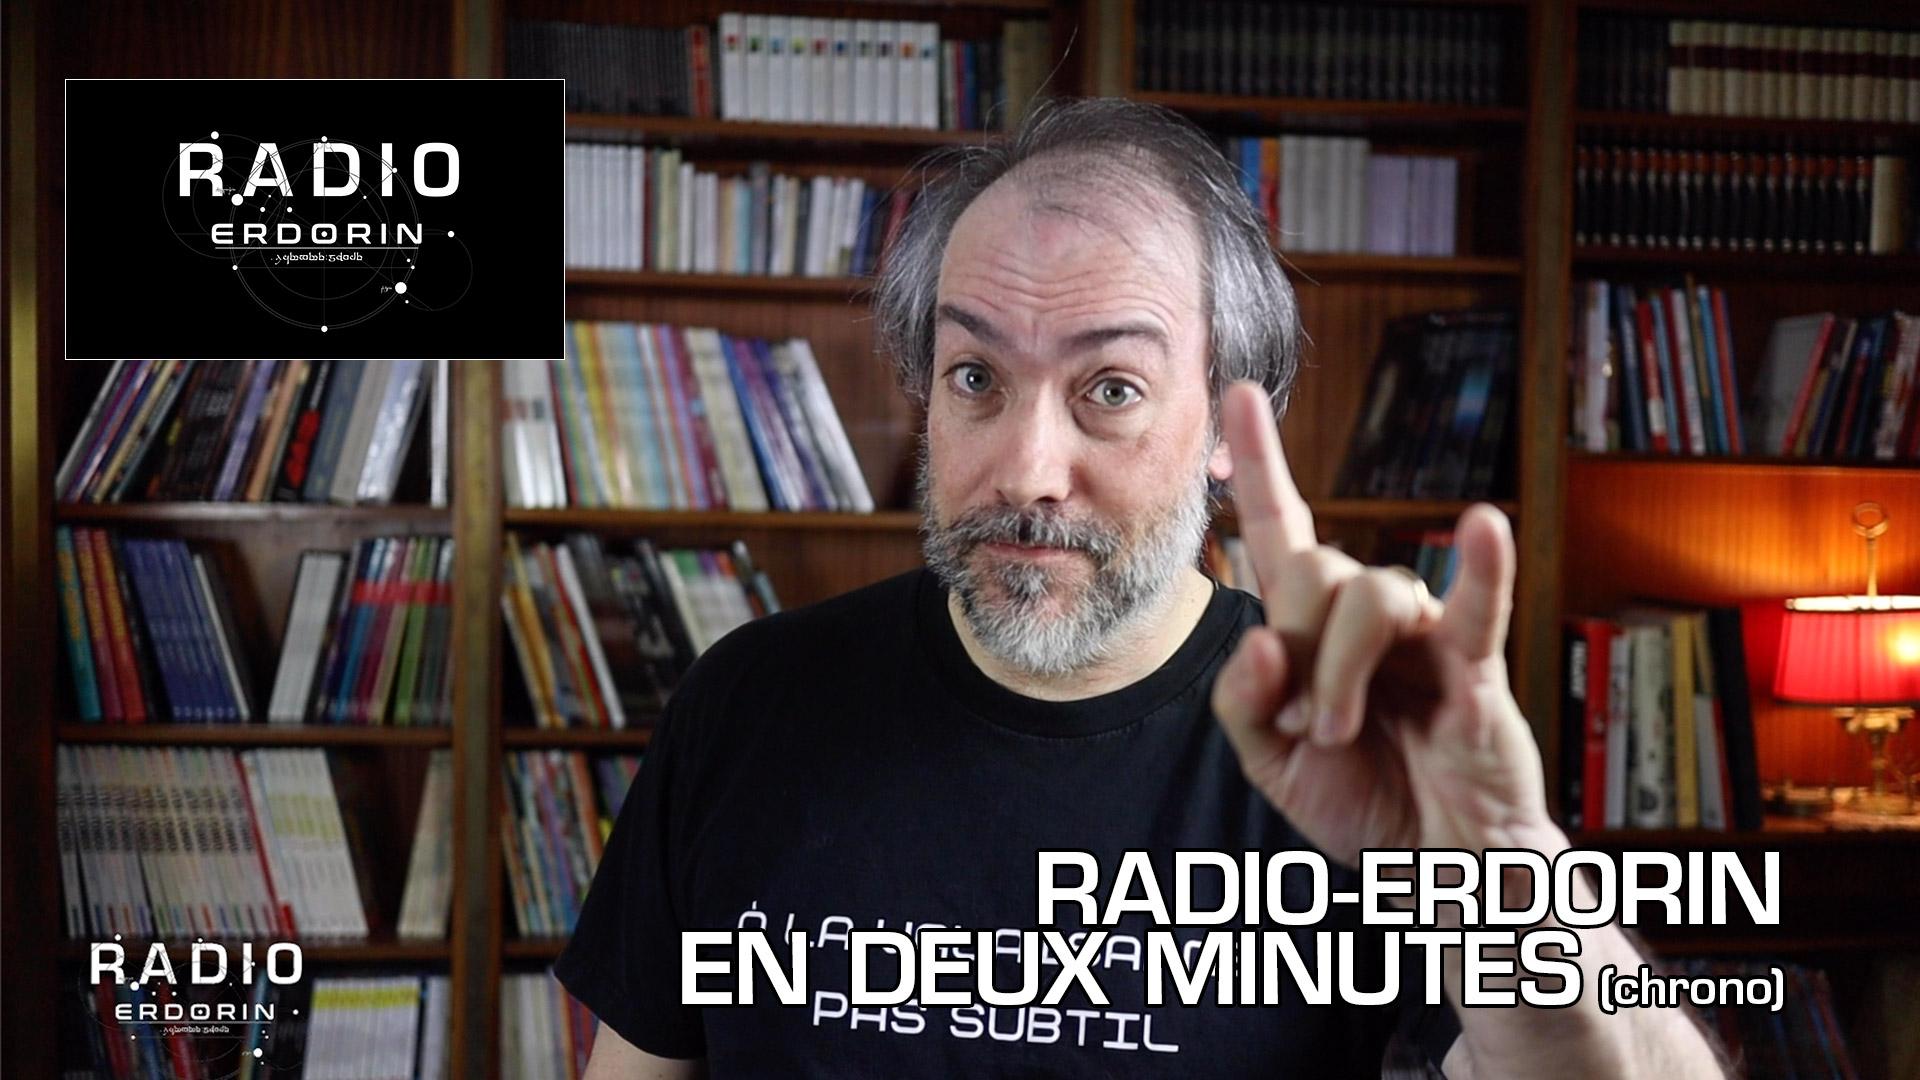 Radio-Erdorin en deux minutes